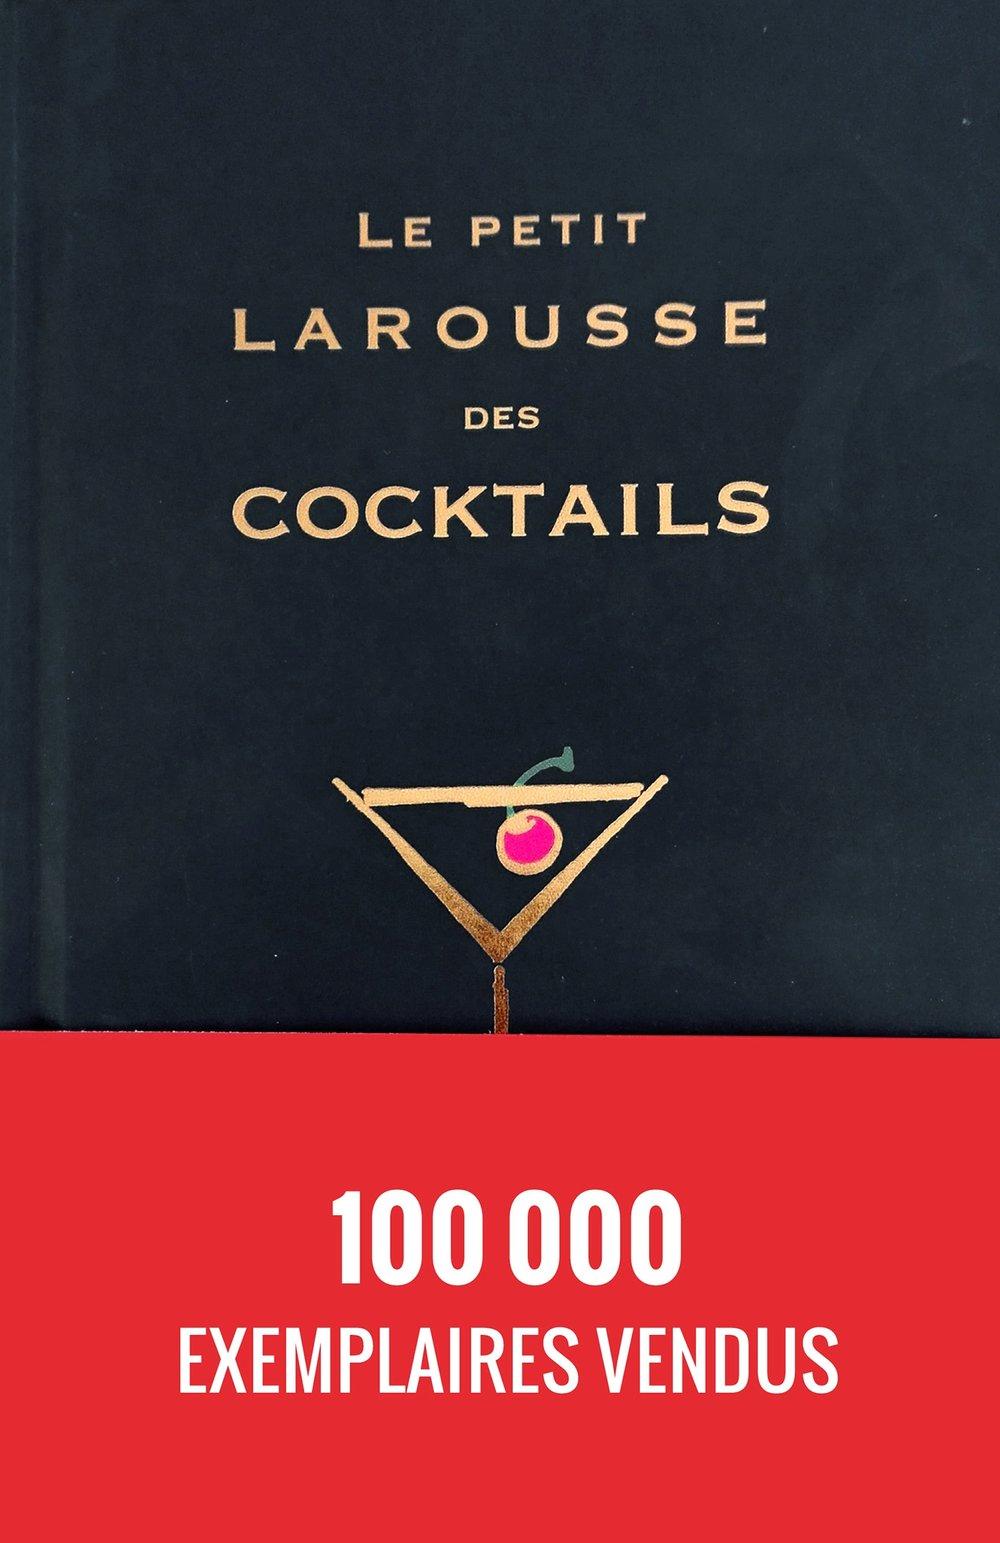 PLI des cocktails HD.jpeg